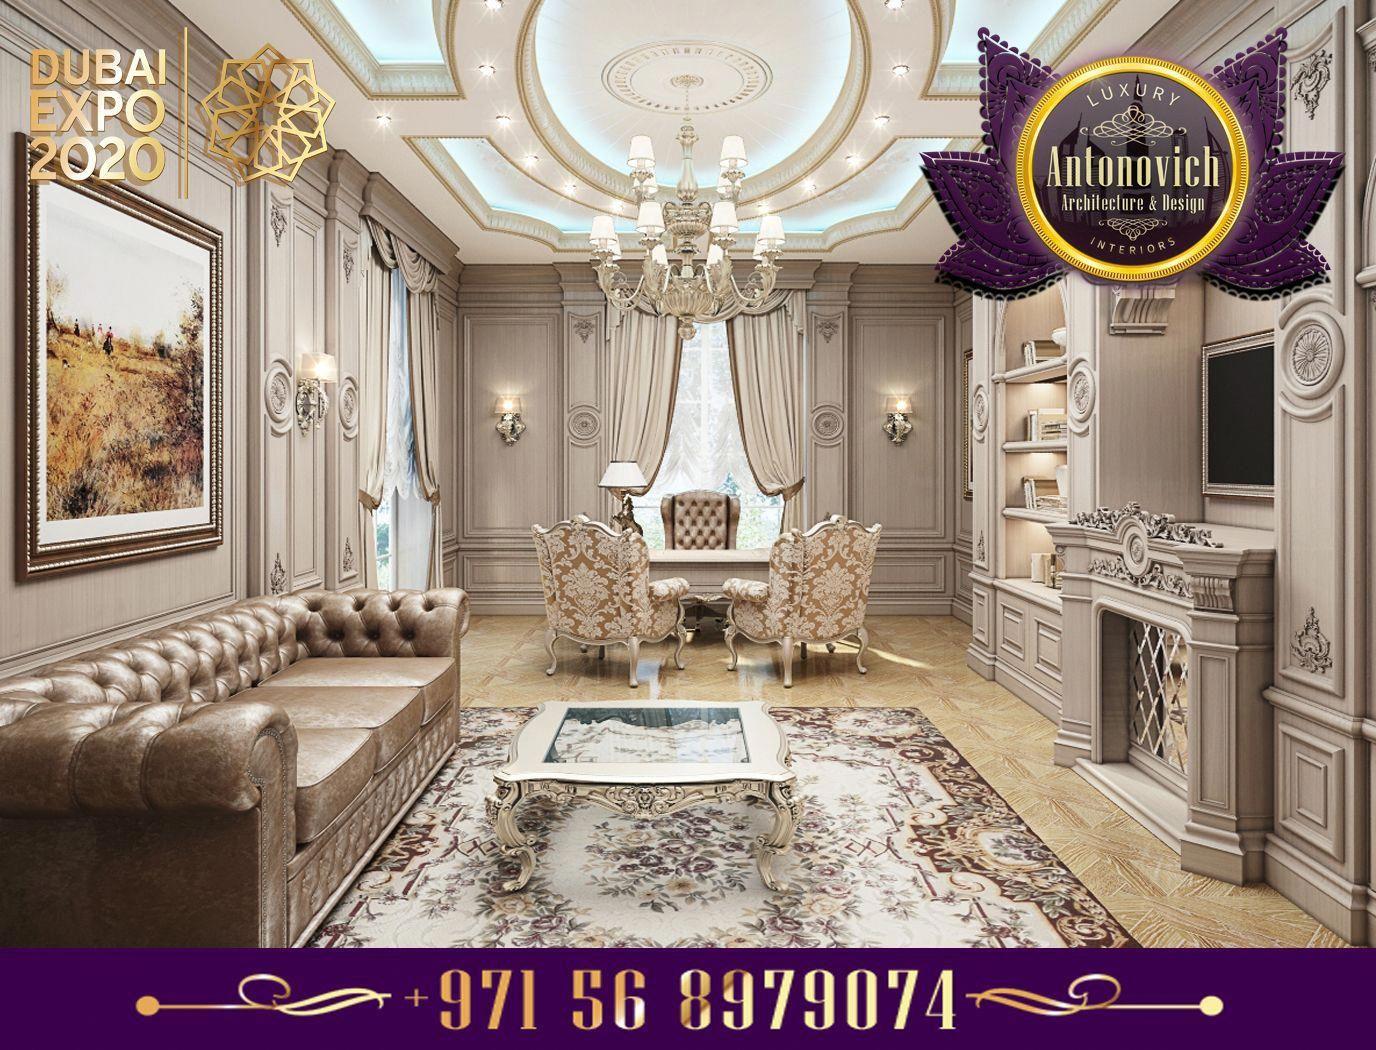 Luxury interior design office dubai expo antonovich interiordesigndubai also rh pinterest